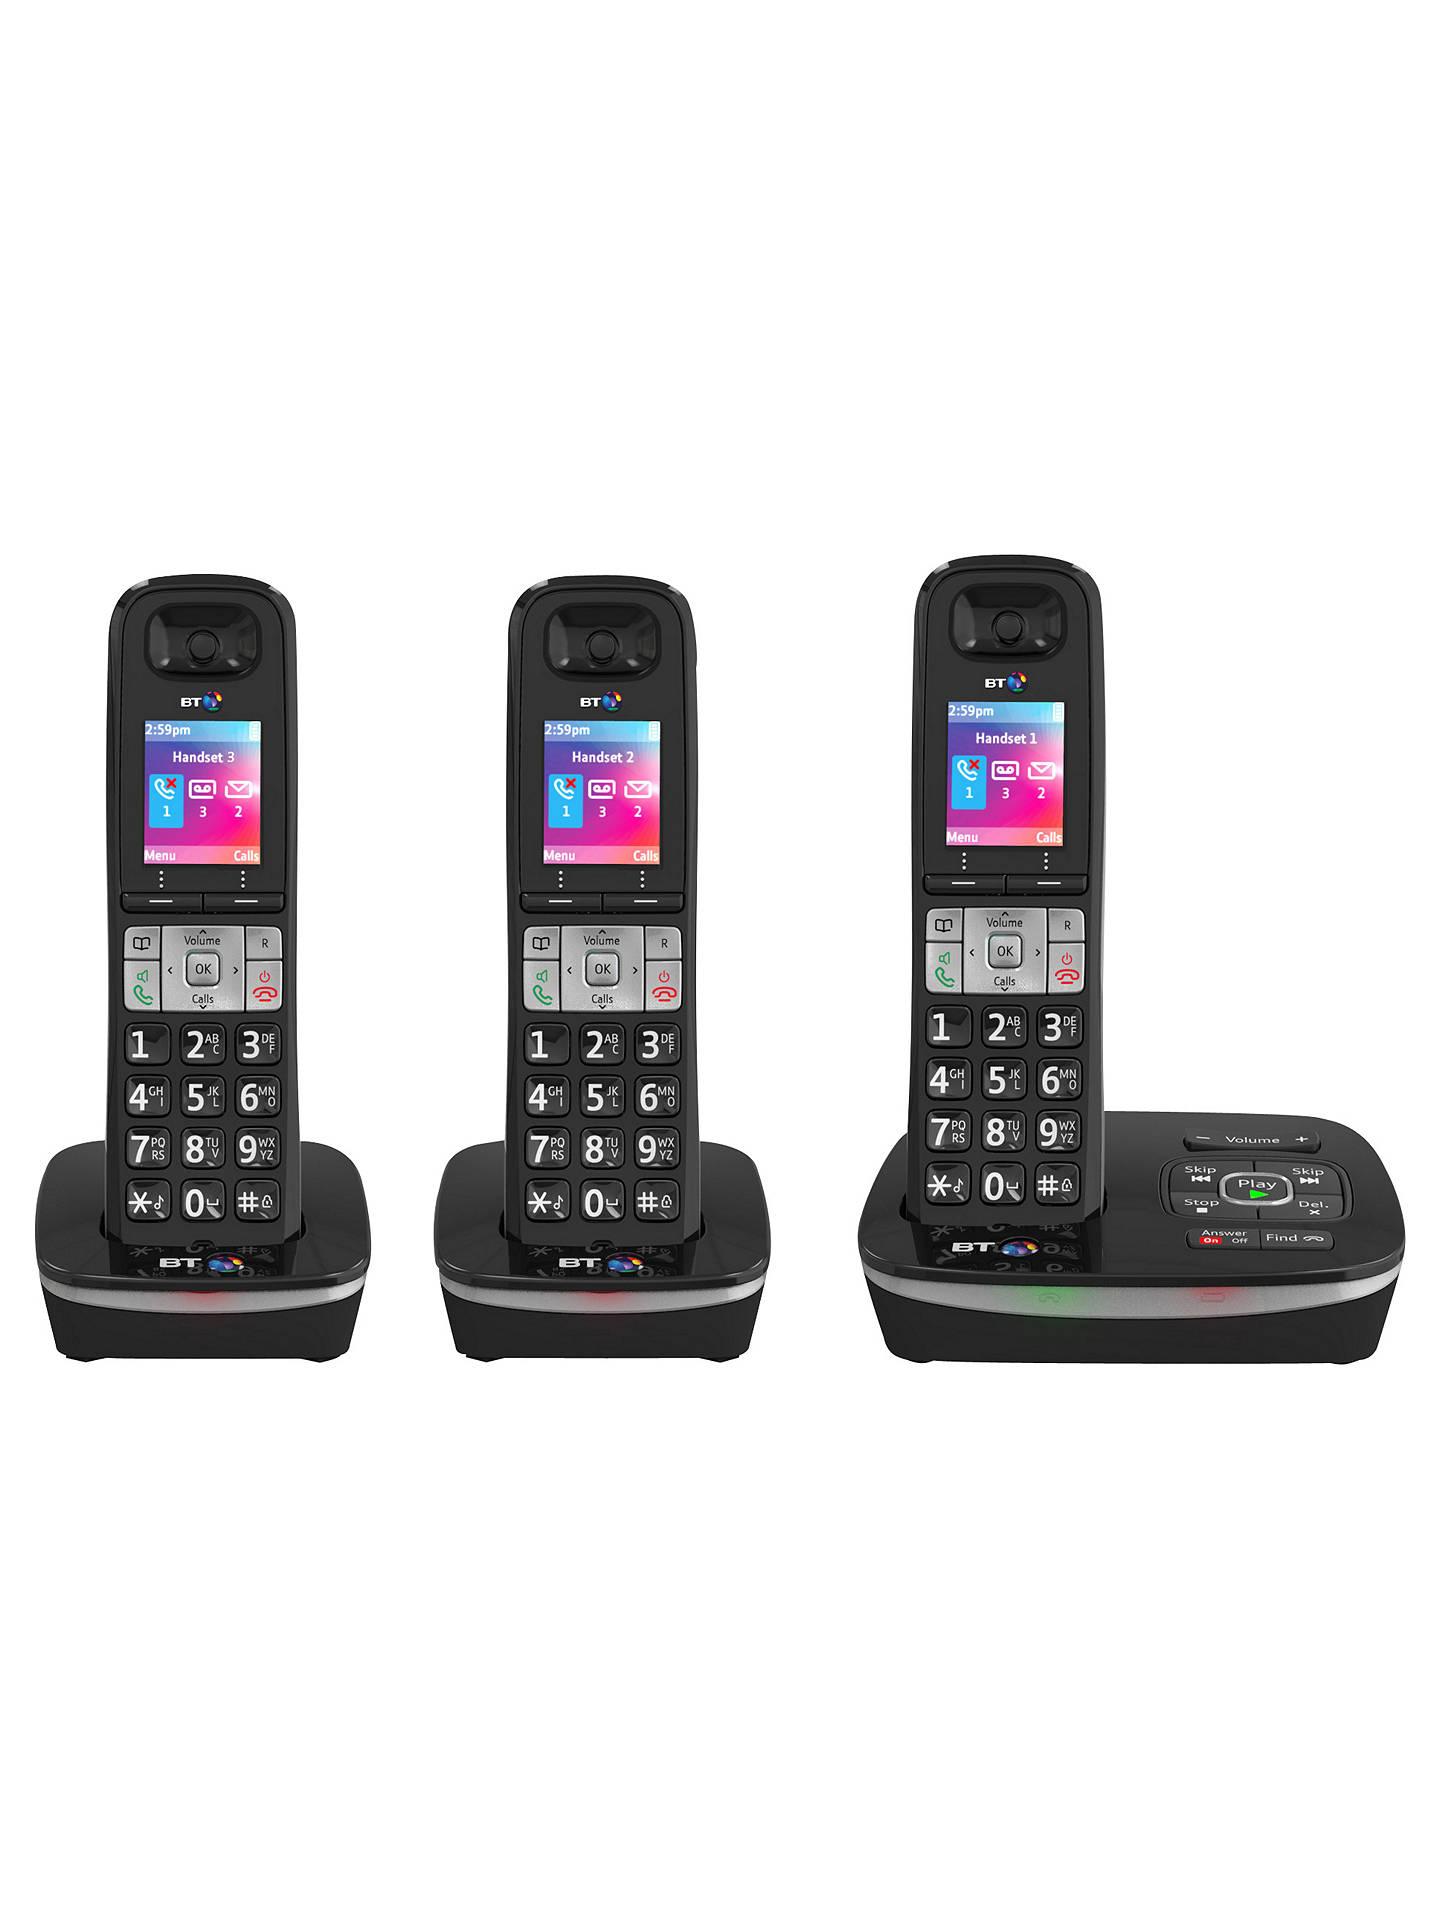 fad11cae1e3 BuyBT 8500 Digital Telephone and Answering Machine with Advanced Call  Blocker